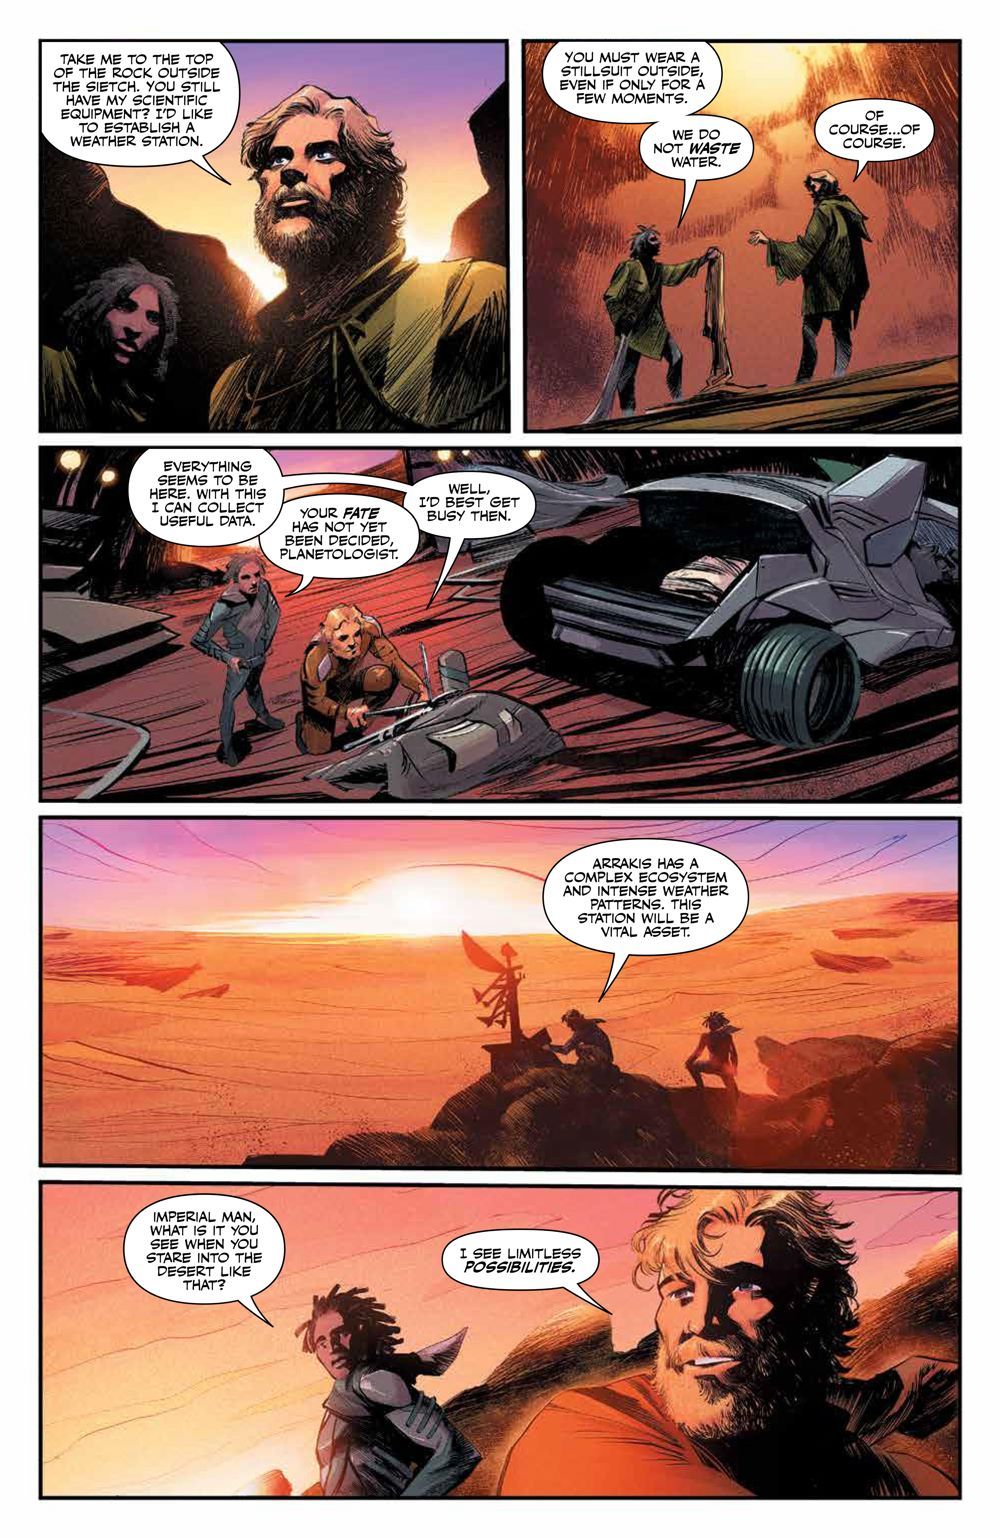 Dune_HouseAtreides_005_PRESS_6 ComicList Previews: DUNE HOUSE ATREIDES #5 (OF 12)